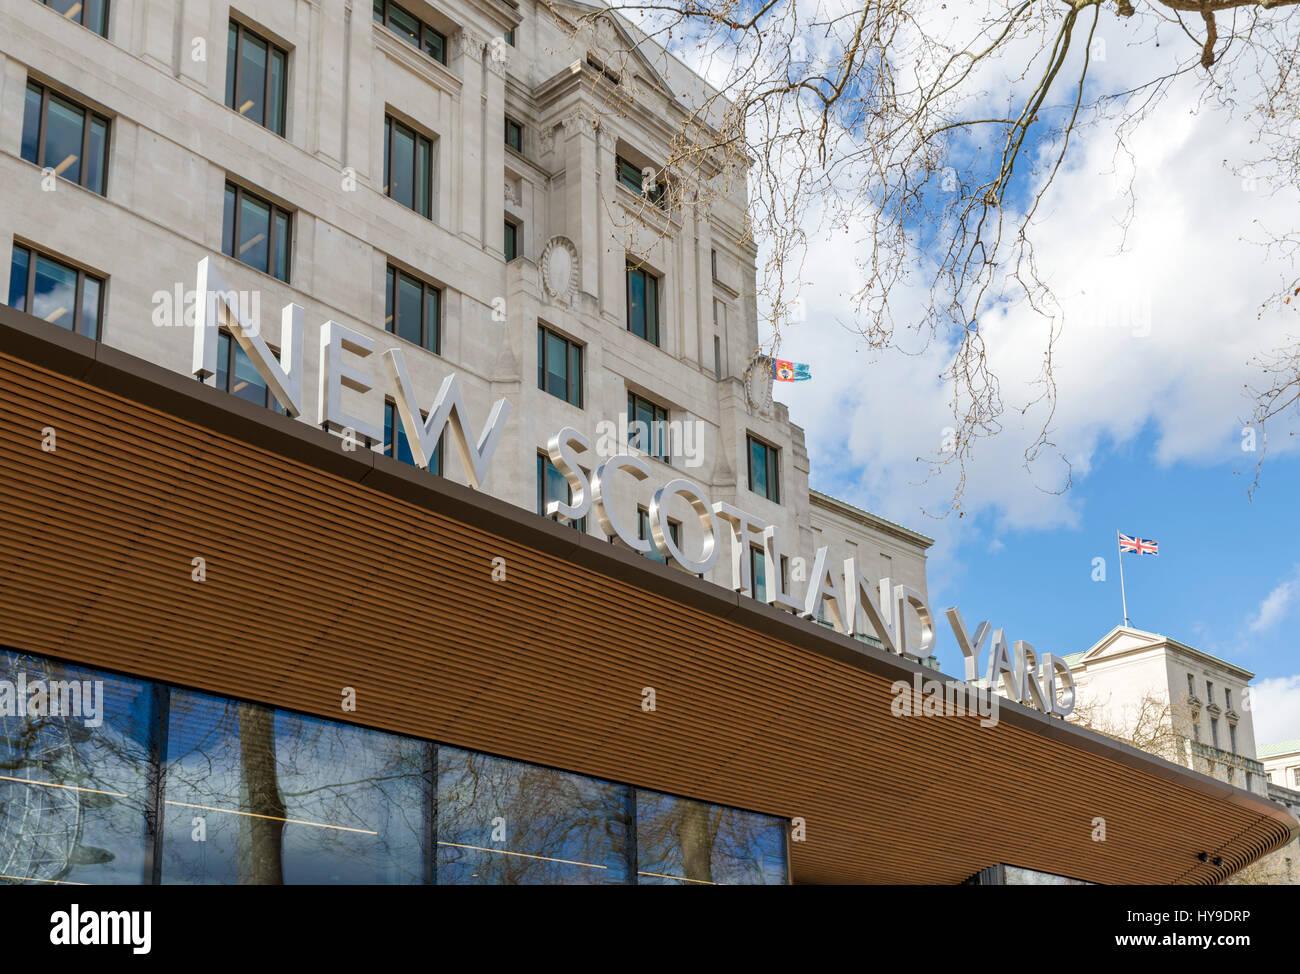 New Scotland Yard, London. Entrance to Metropolitan Police headquarters at New Scotland Yard, Victoria Embankment, - Stock Image